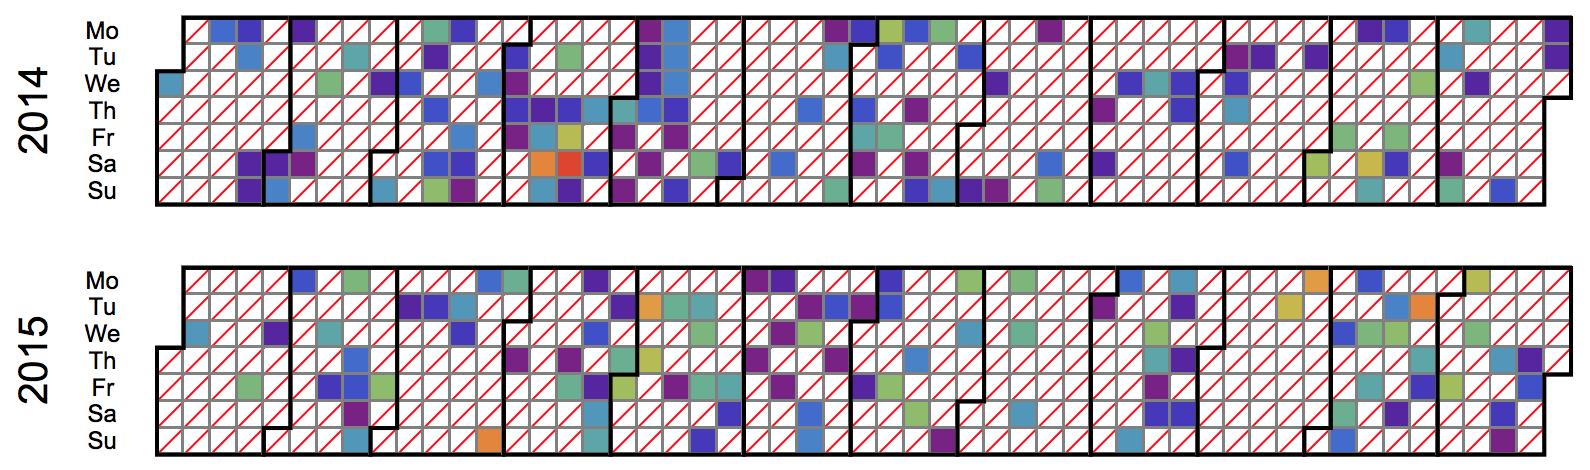 Output graphics